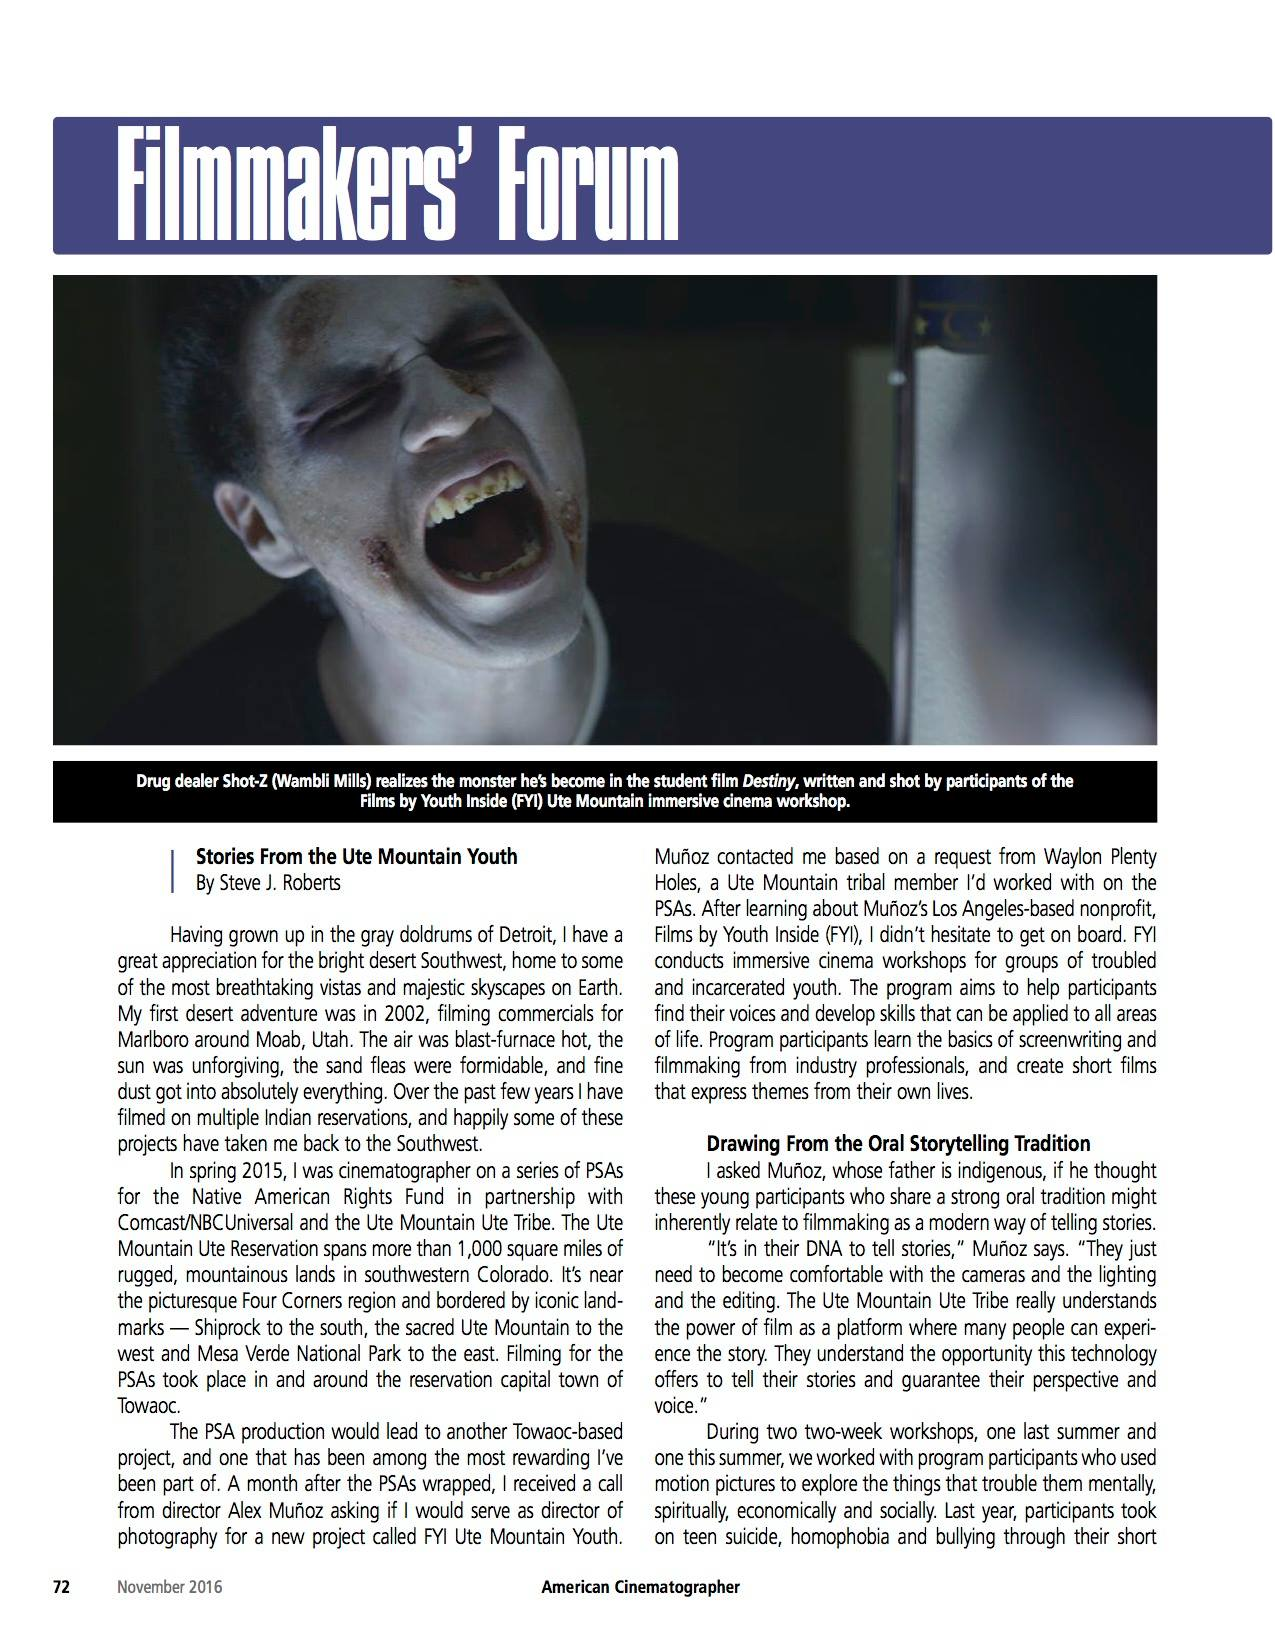 American Cinematographer Magazine, November 2016 Edition